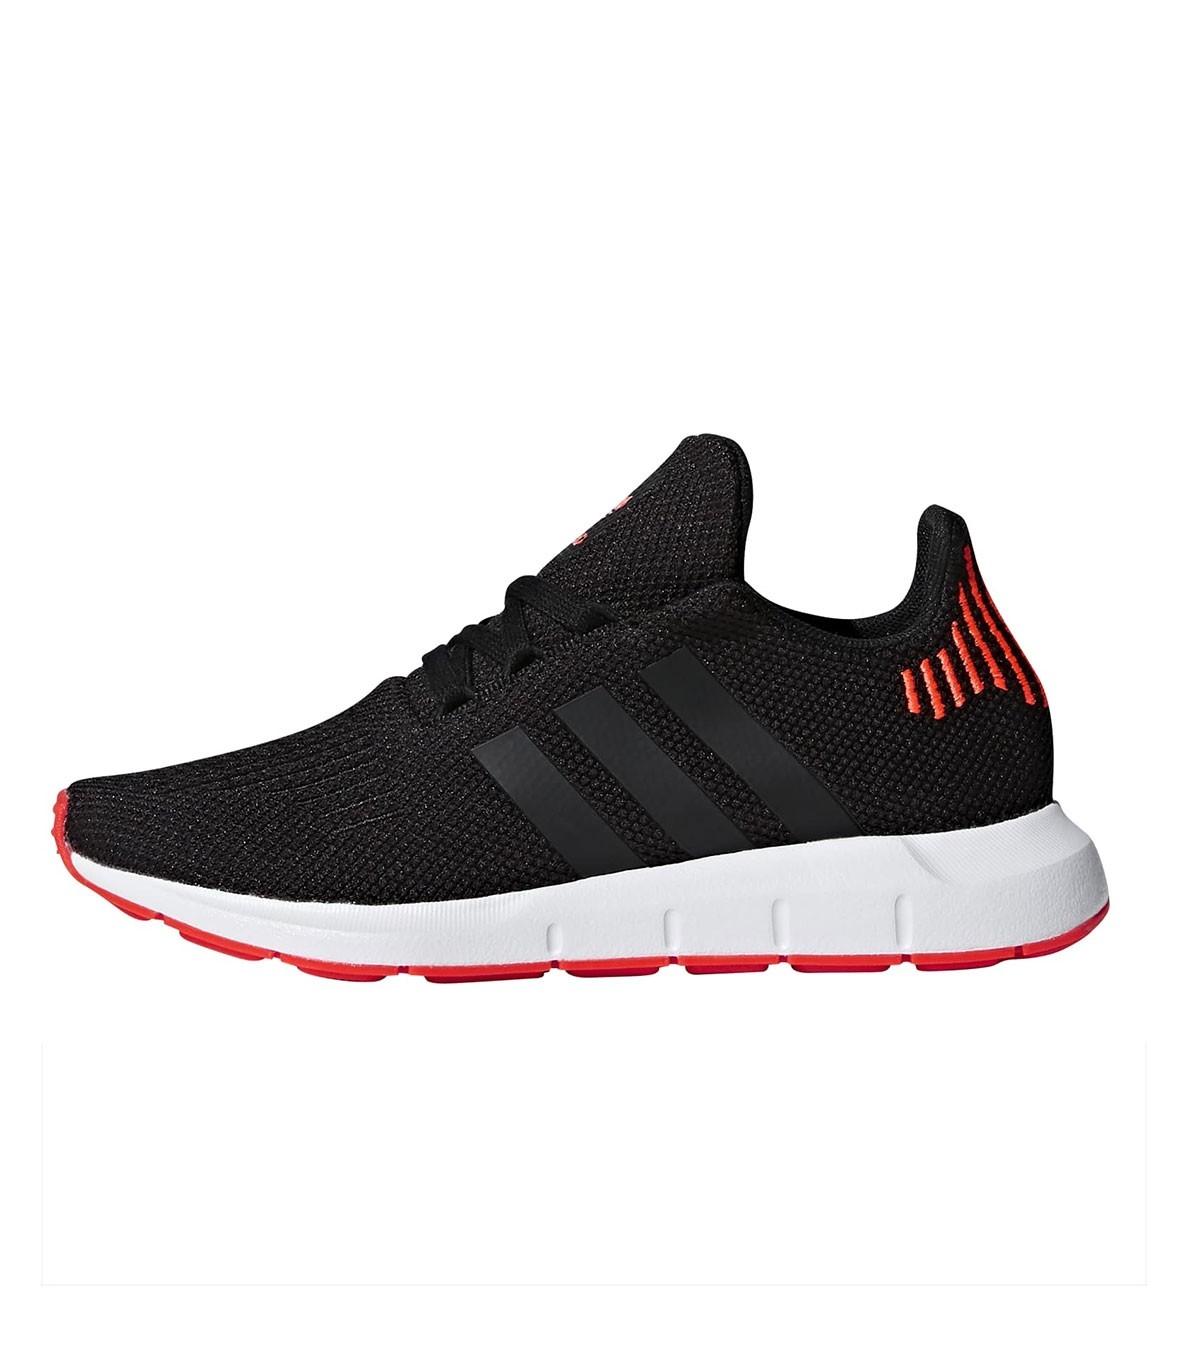 finest selection f15d5 4b1b6 Adidas Lite Racer Cln K Zapatilla